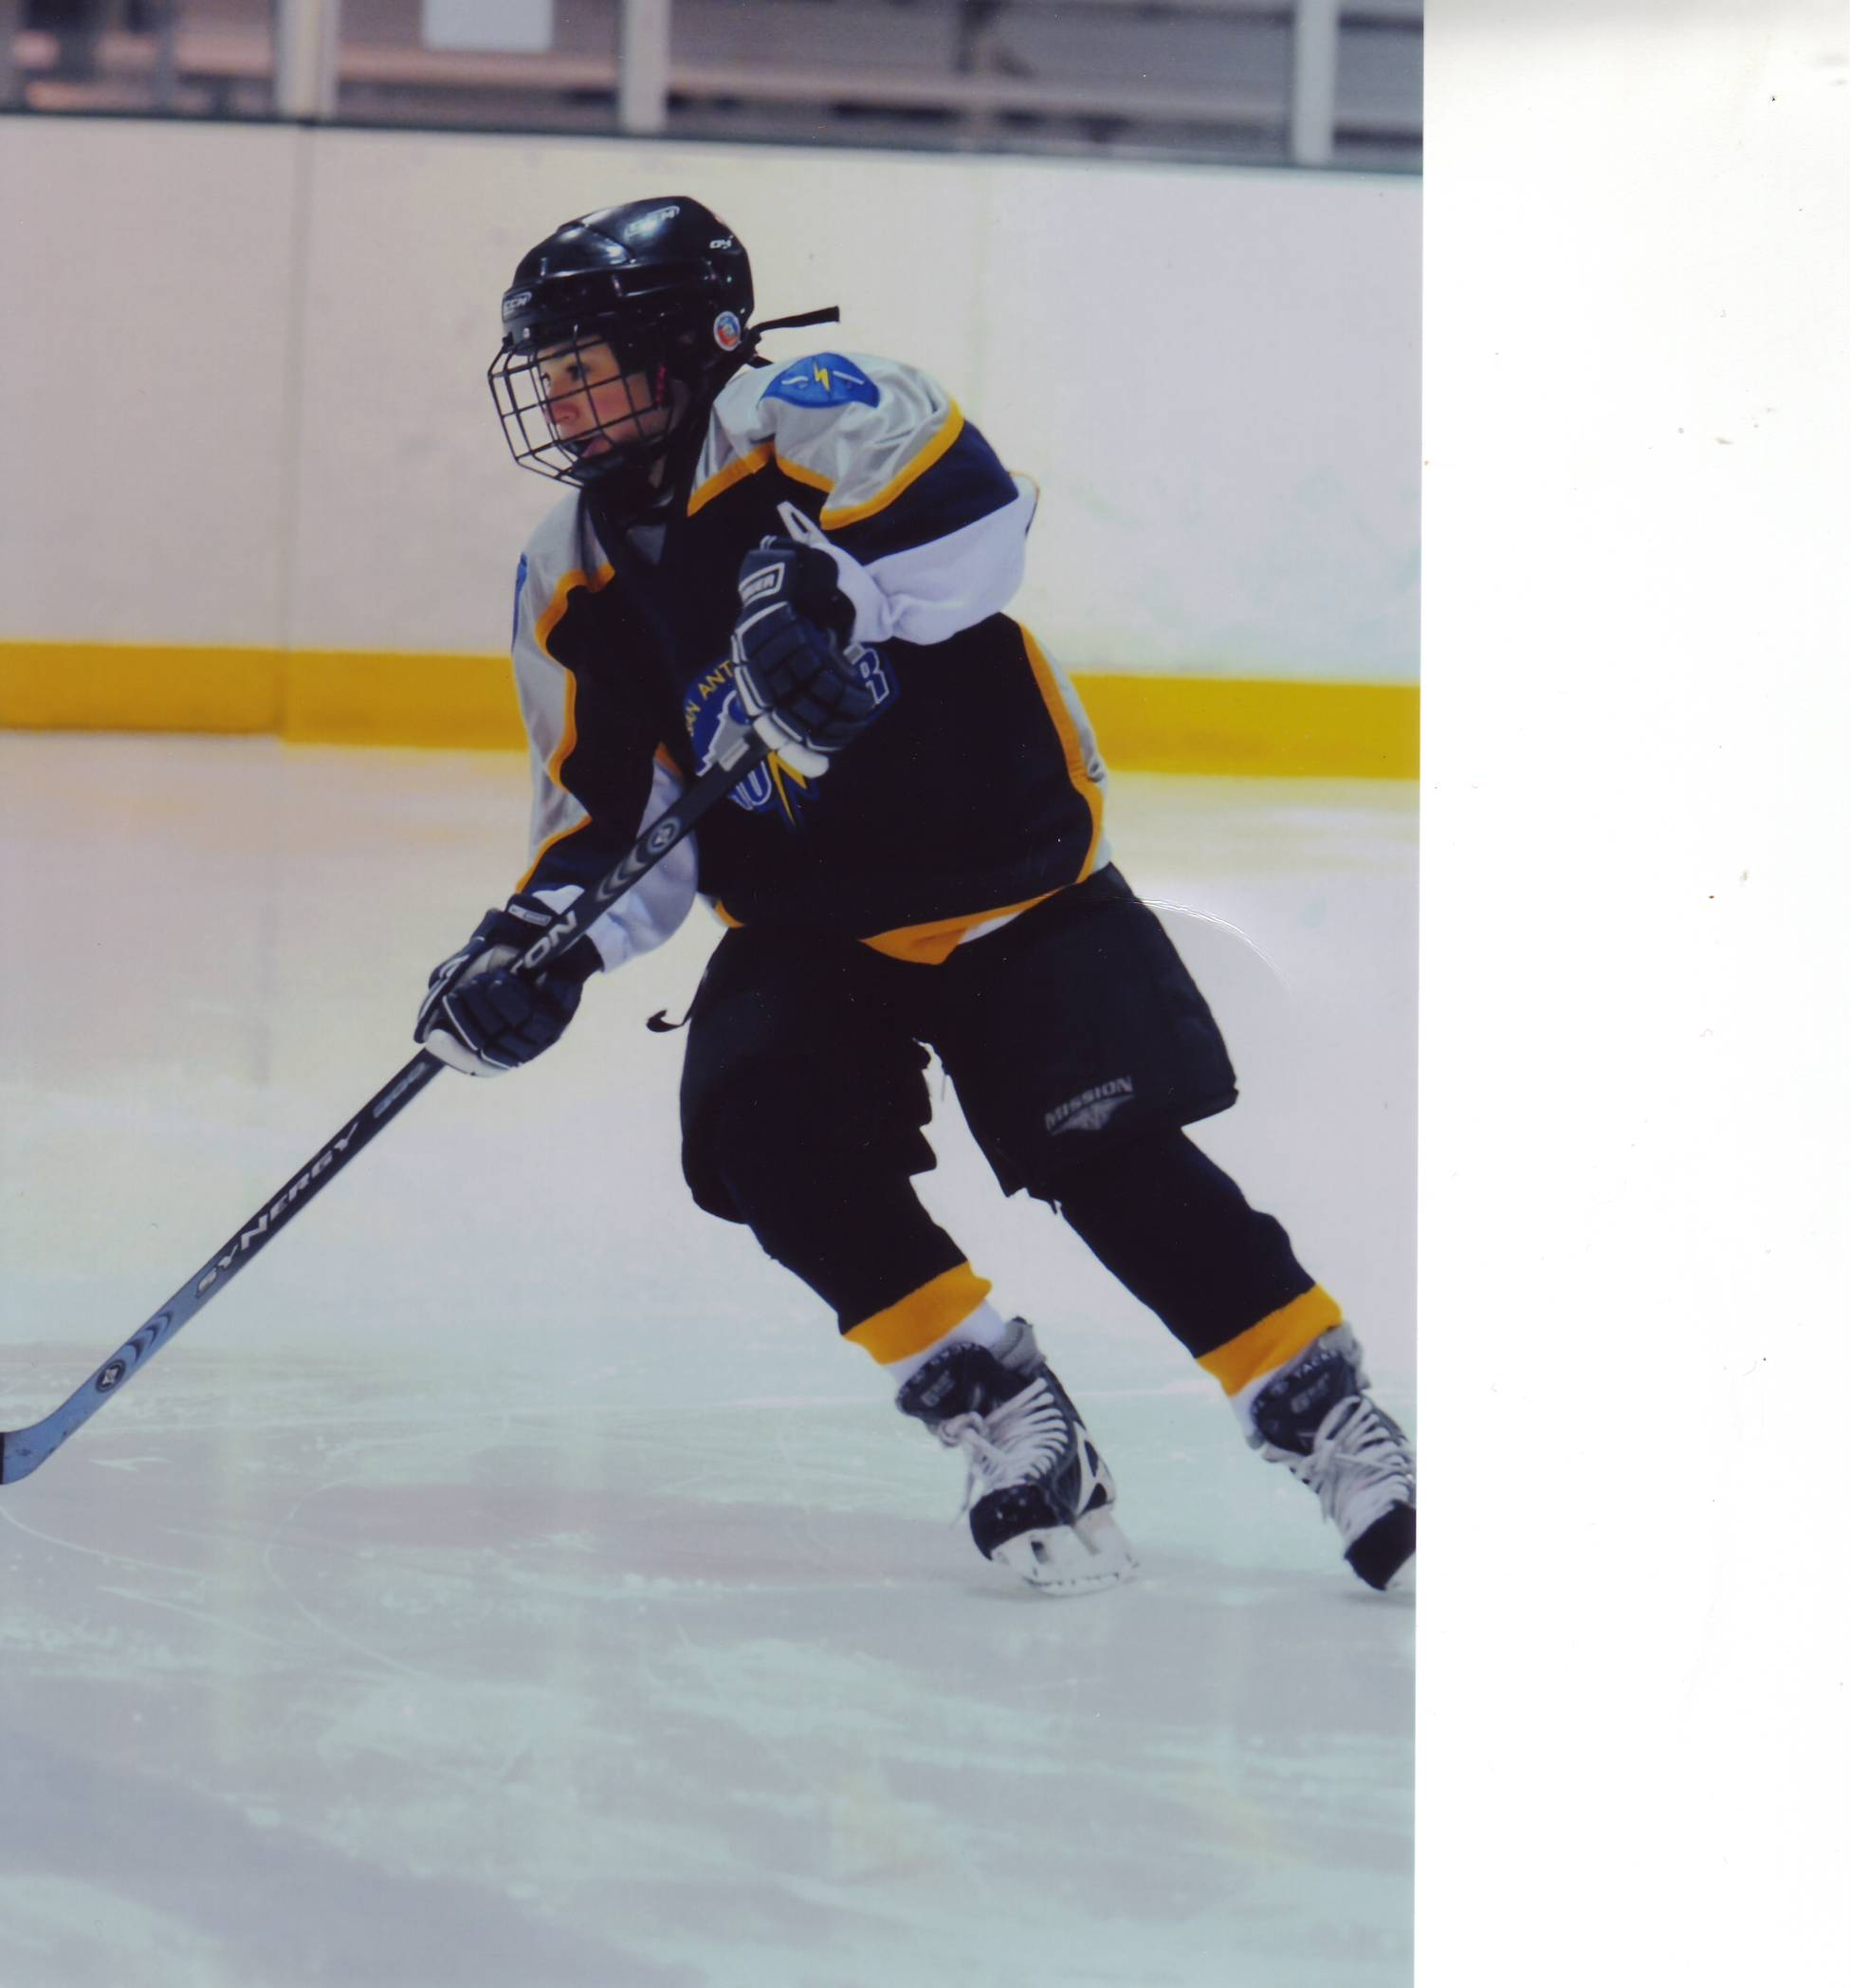 USA Warriors betfair casino - online casino australia ice hockey |betfair sports rules Sled Ice Hockey